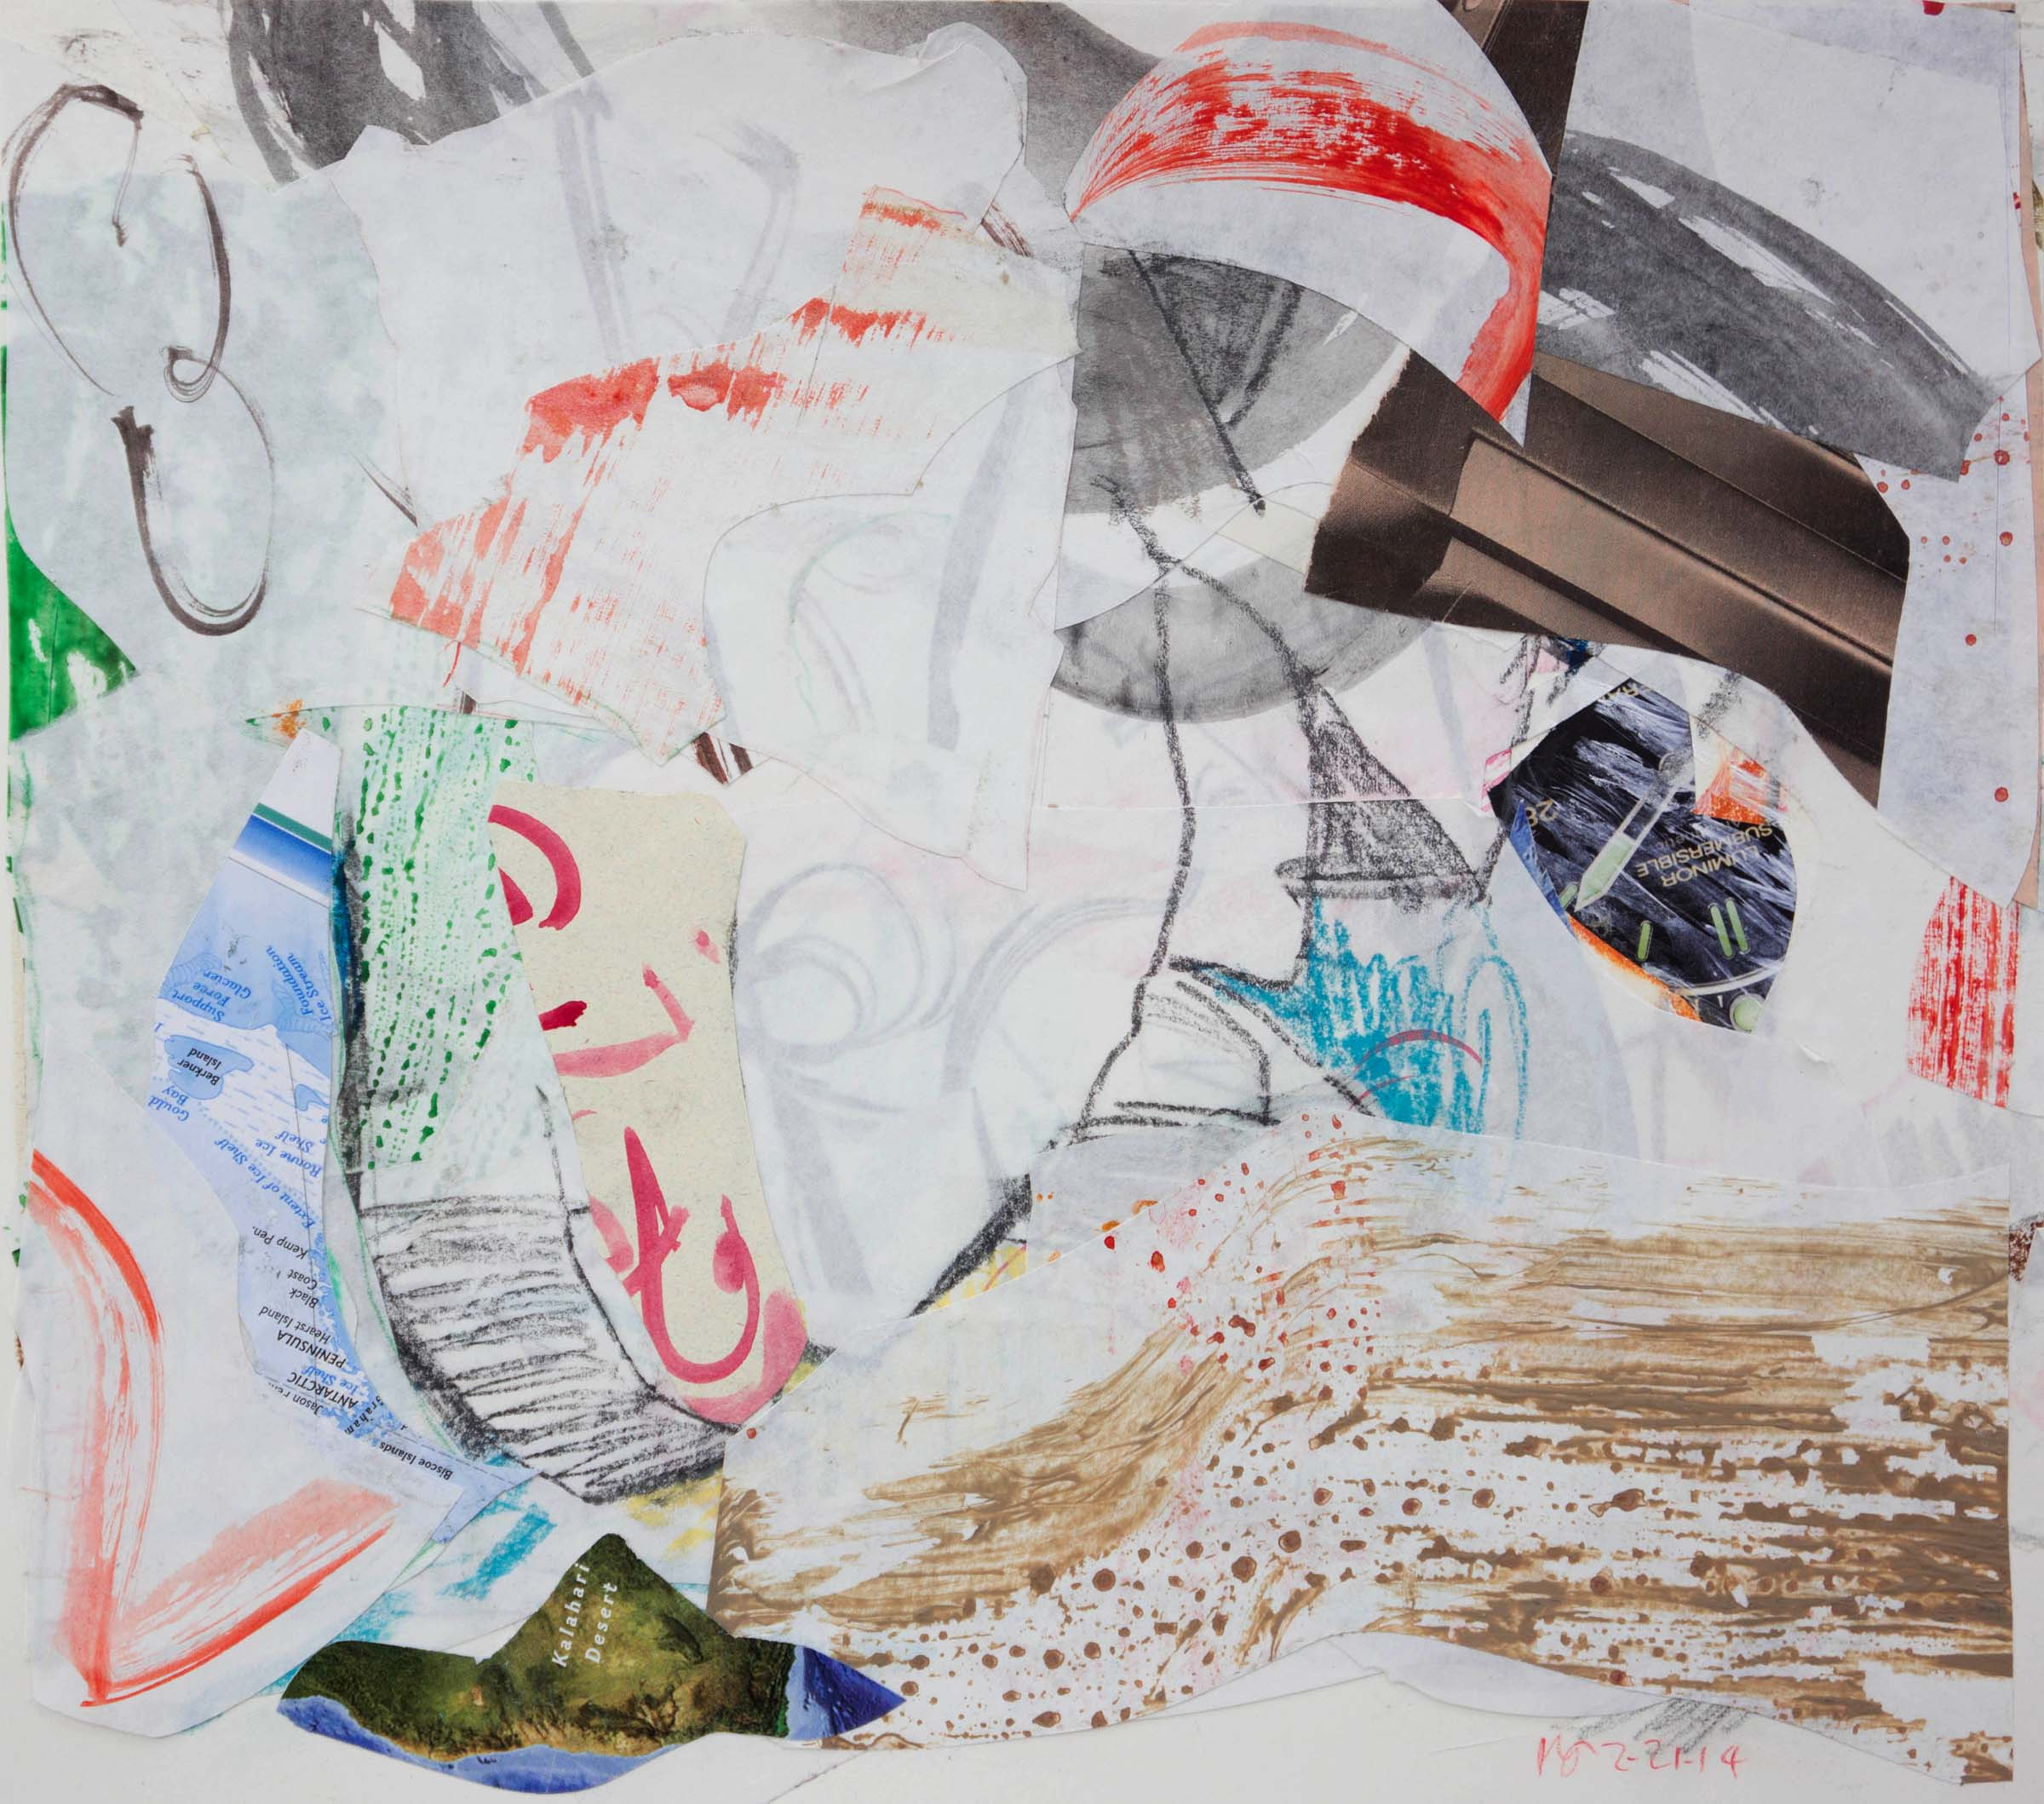 2/21/14 kalahari   collage-mixed media on paper